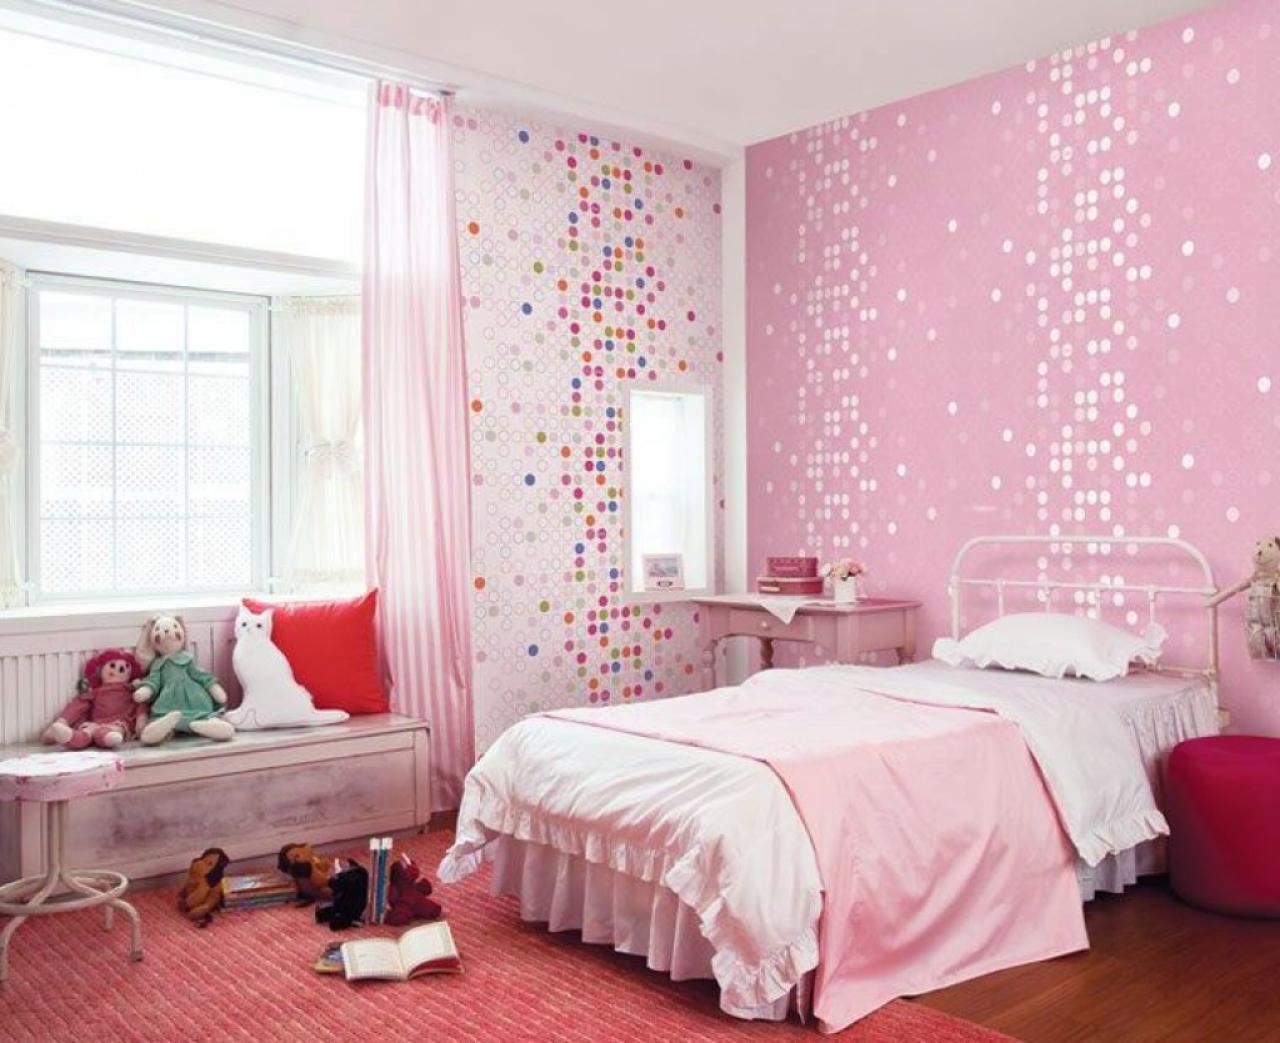 Free download room cute pink dotty wallpaper girls bedroom ...